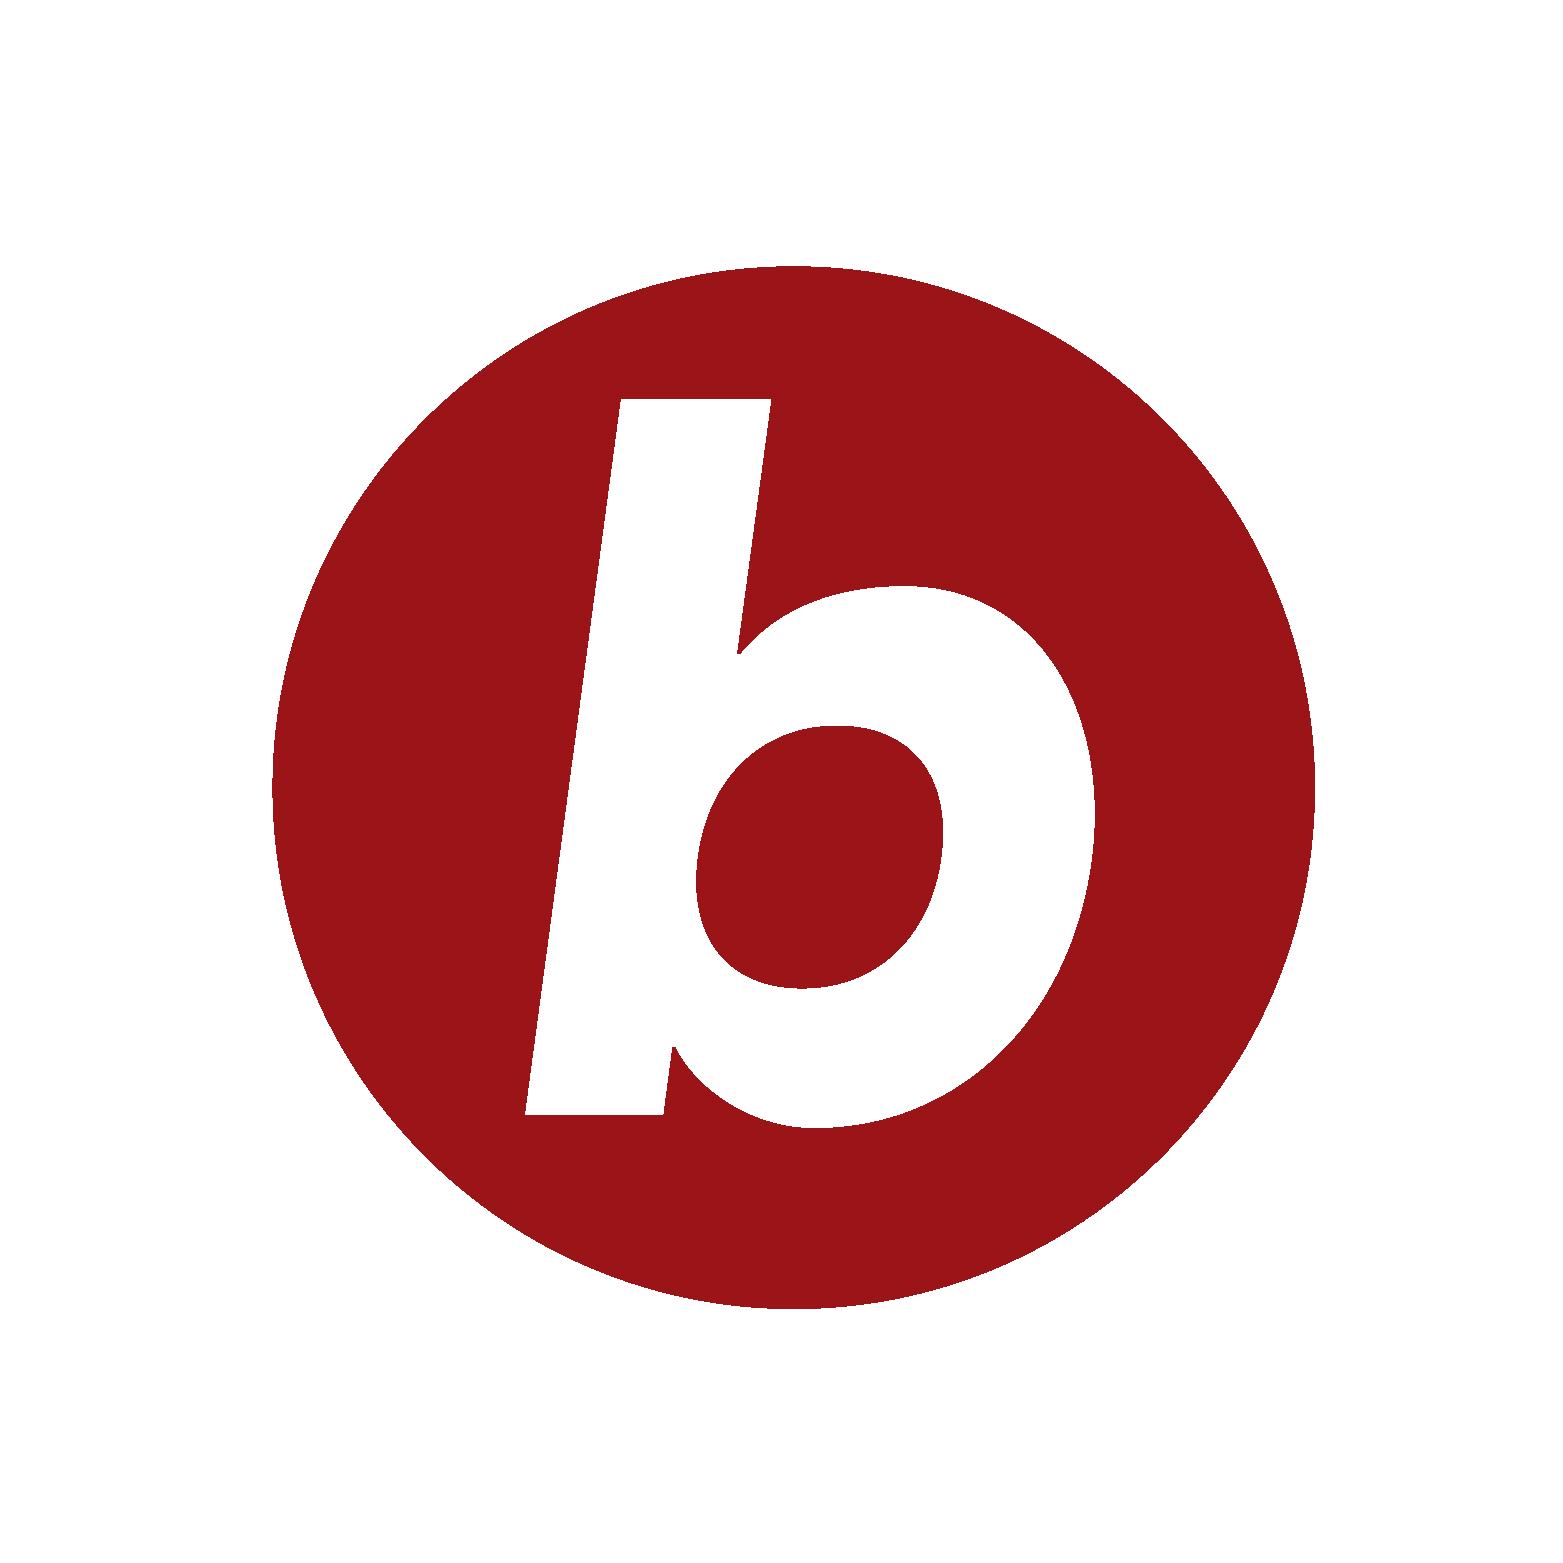 20171112234014!Boston.com_red_circular_logo.png